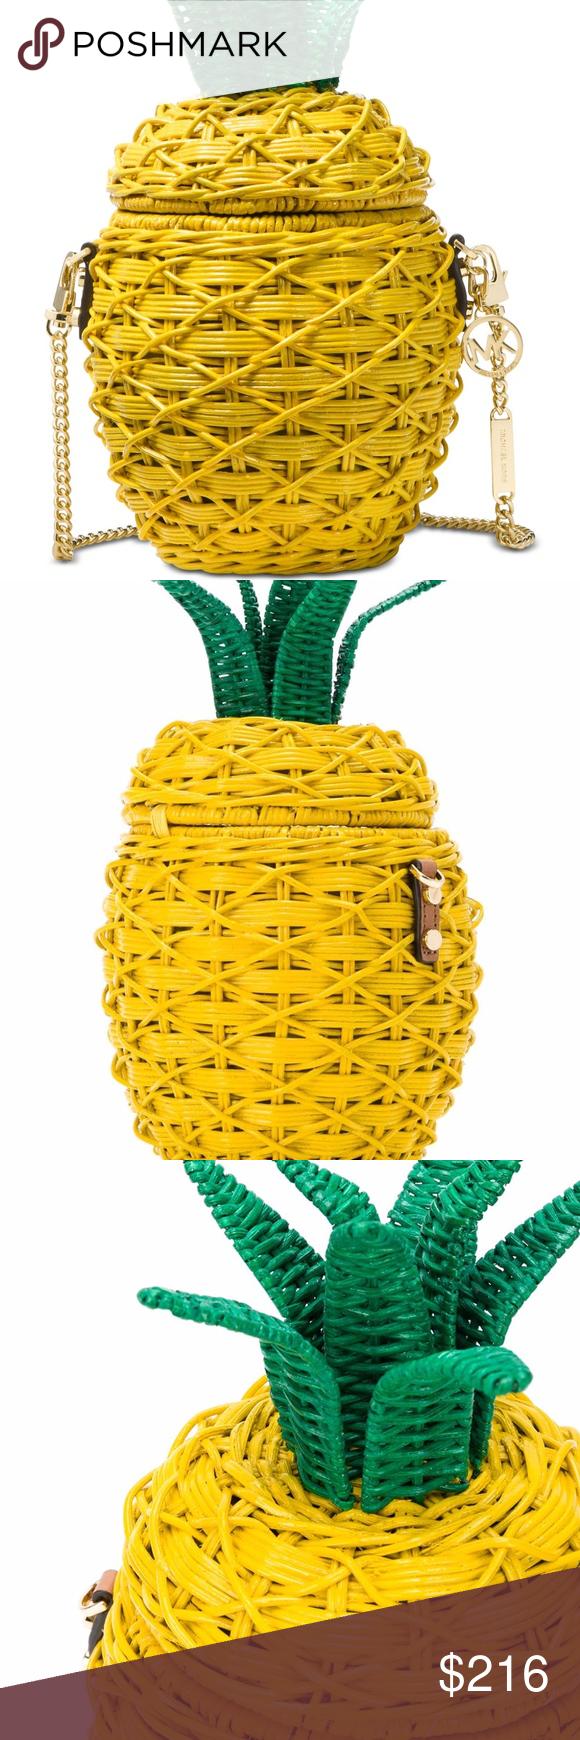 fd8ca036a252 Michael Kors Straw Pineapple Crossbody A splash of color and fun. MICHAEL  Michael Kors'